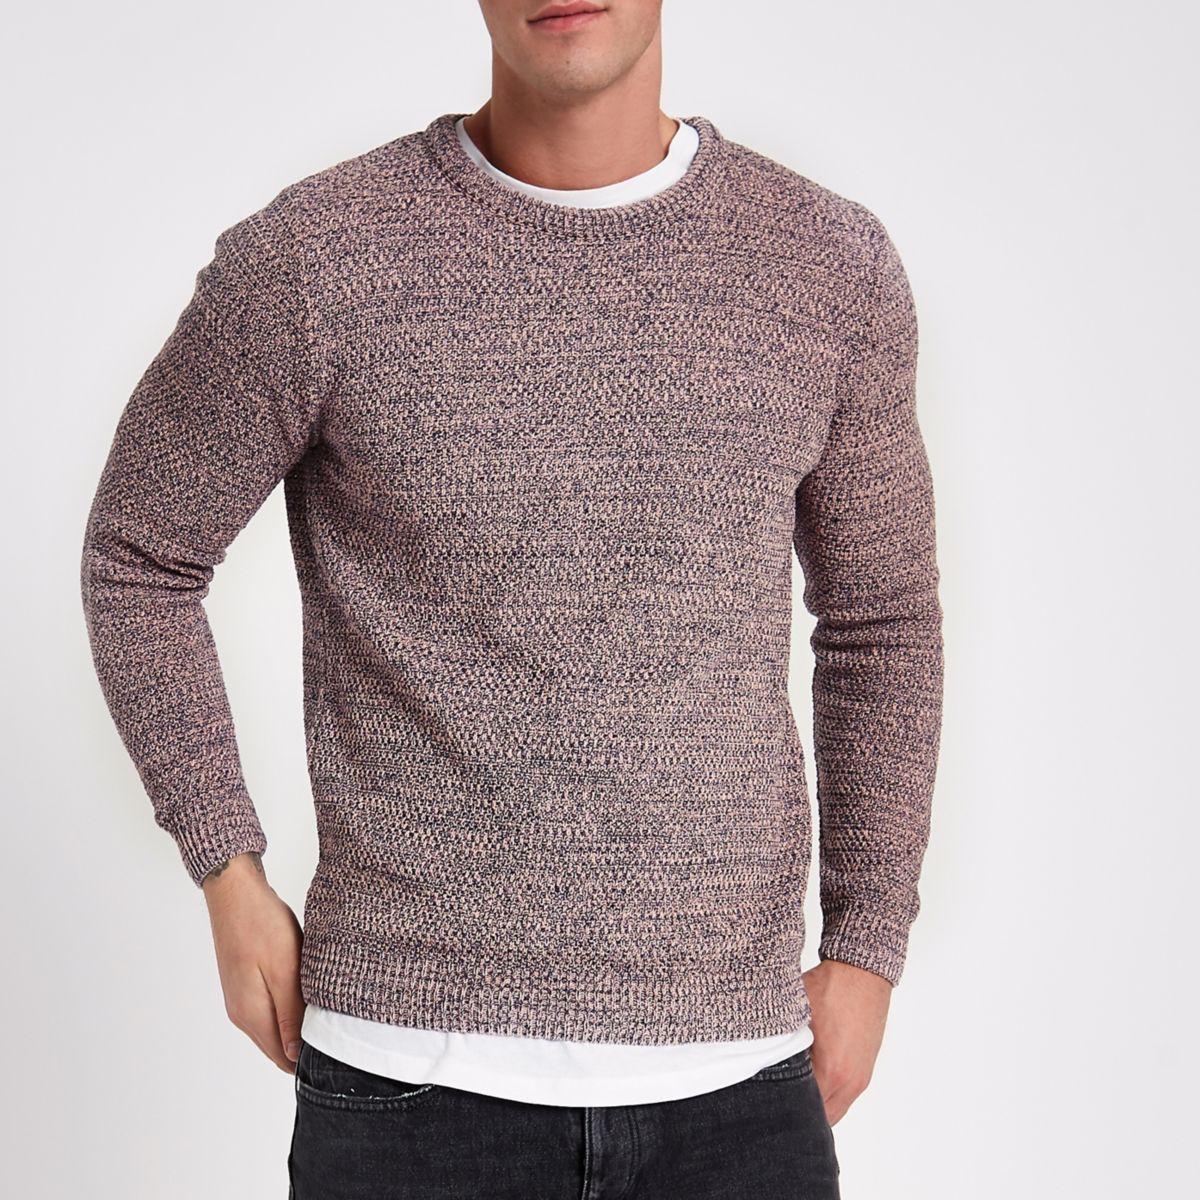 Pink textured knit slim fit crew neck jumper